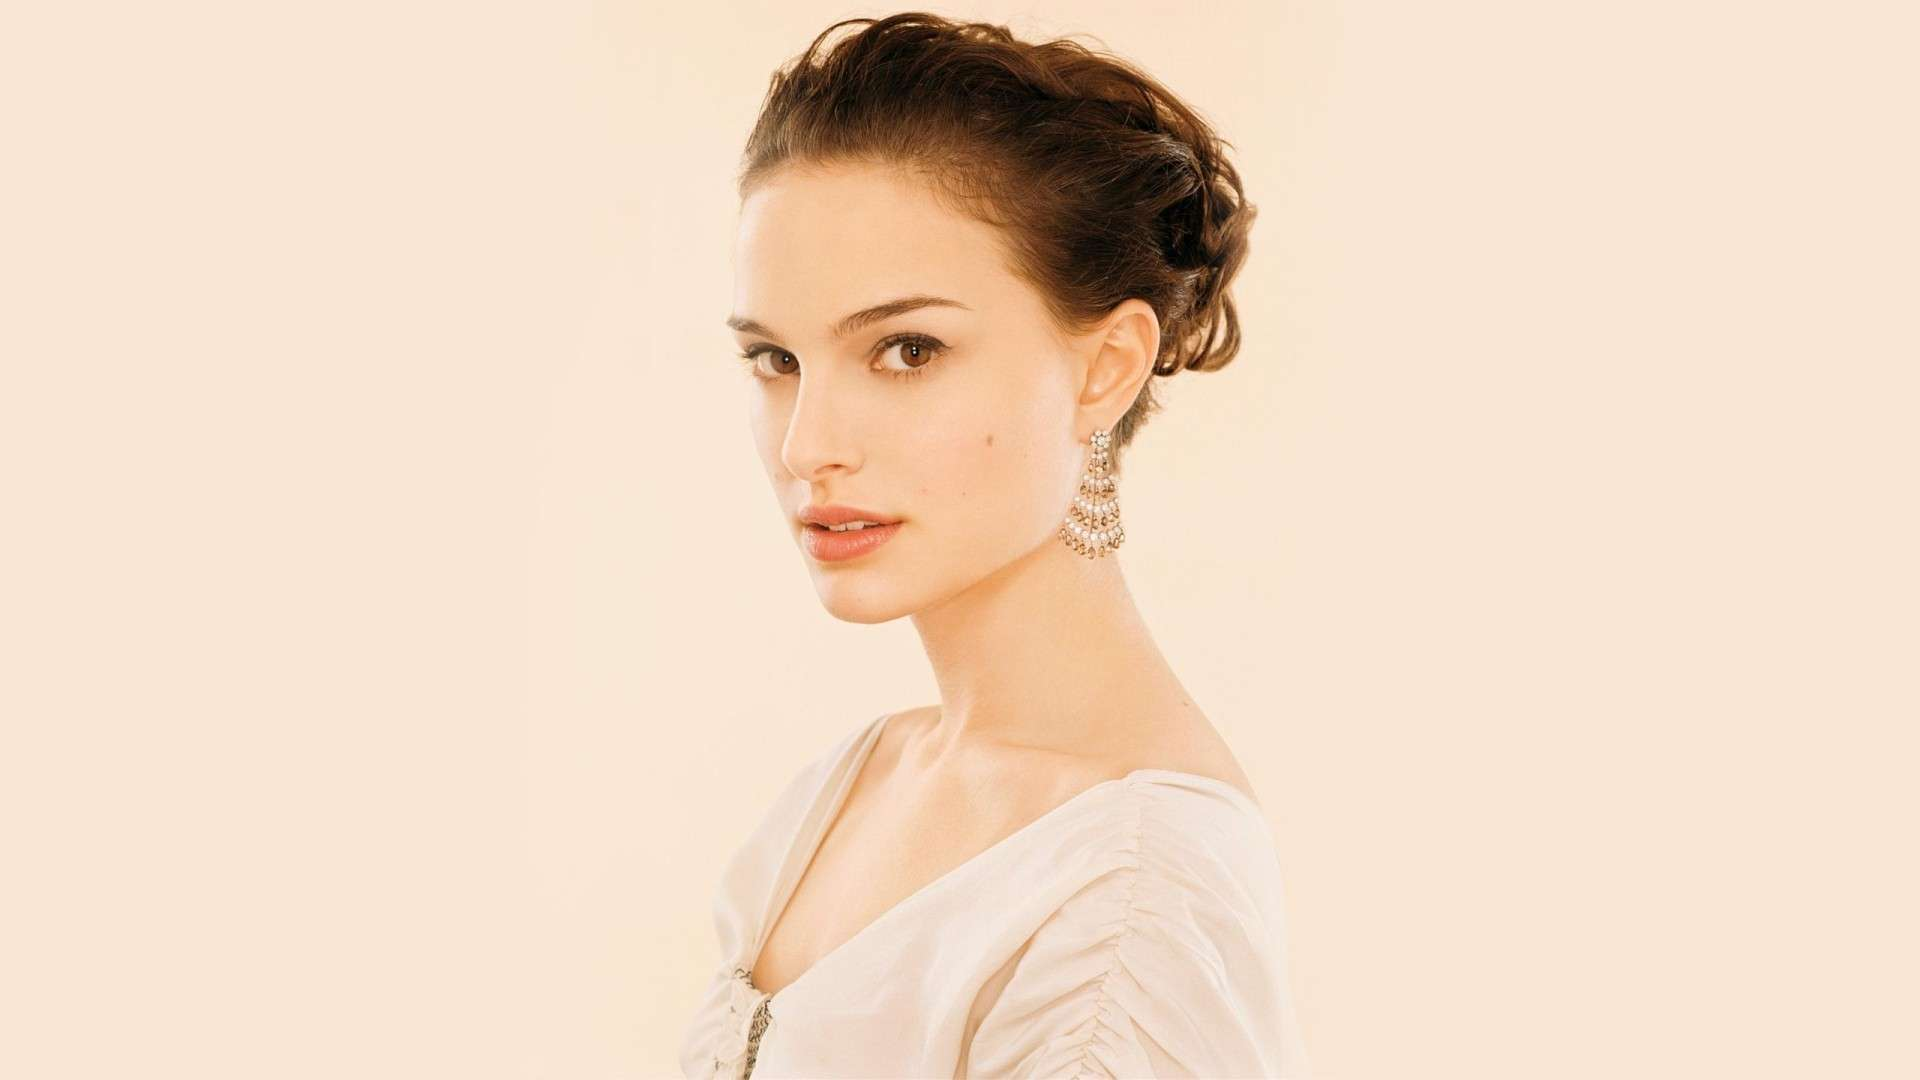 Pictures Of Natalie Portman